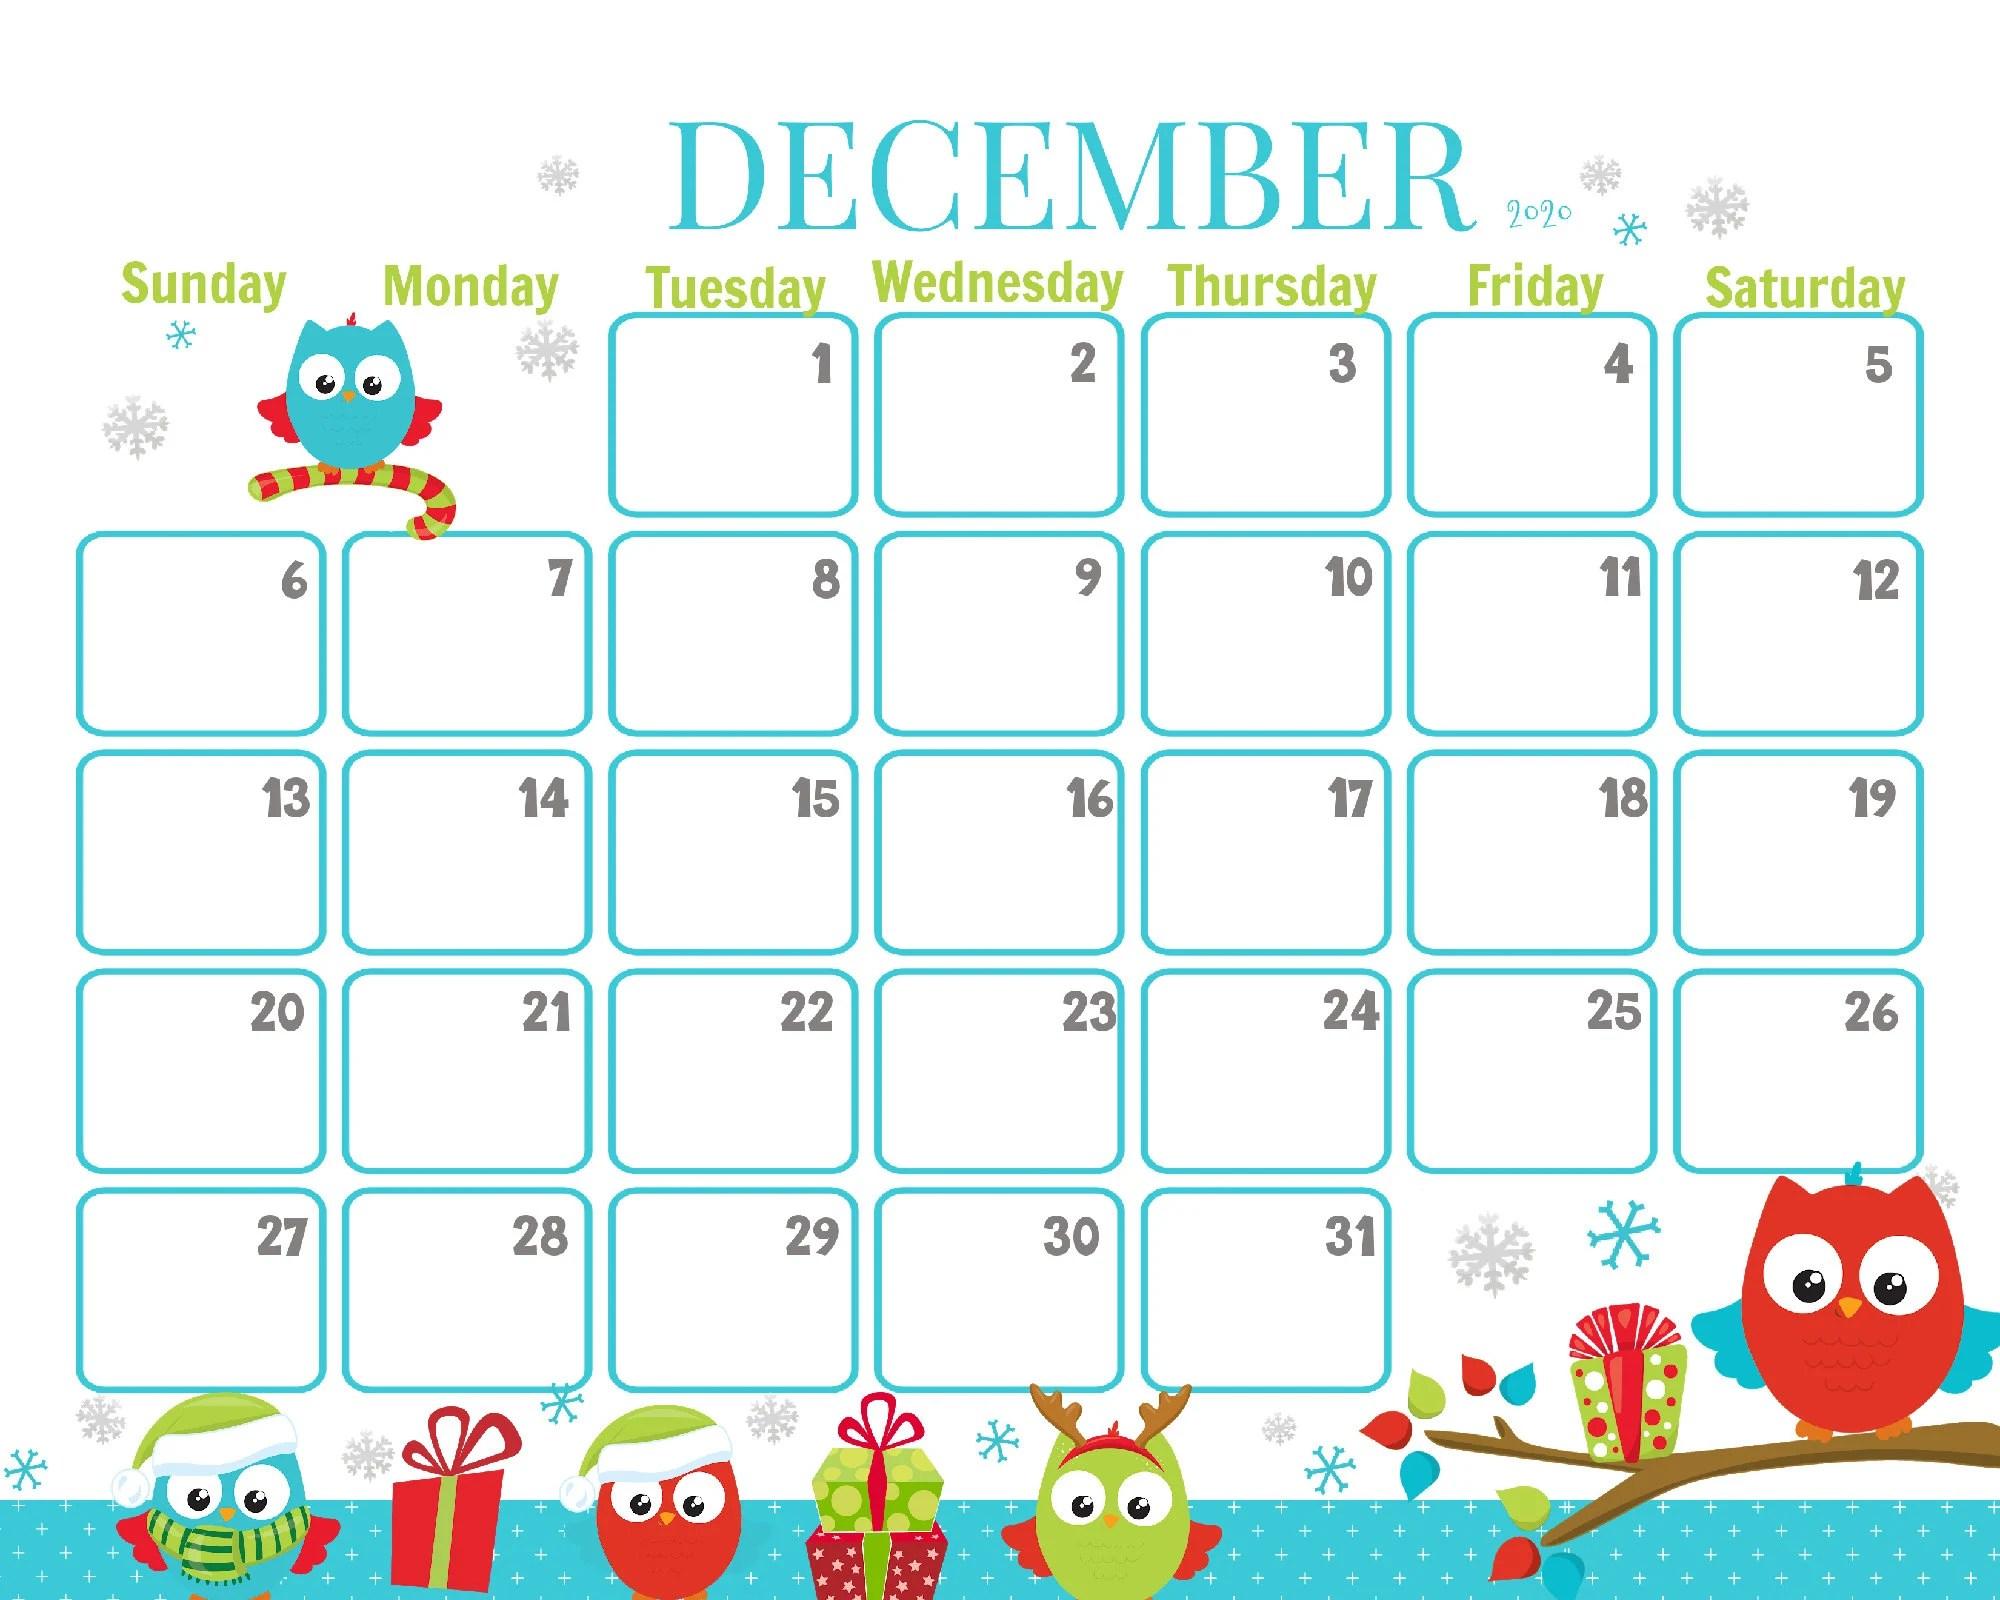 December 2020 Christmas Owls Calendar Printable Christmas ...